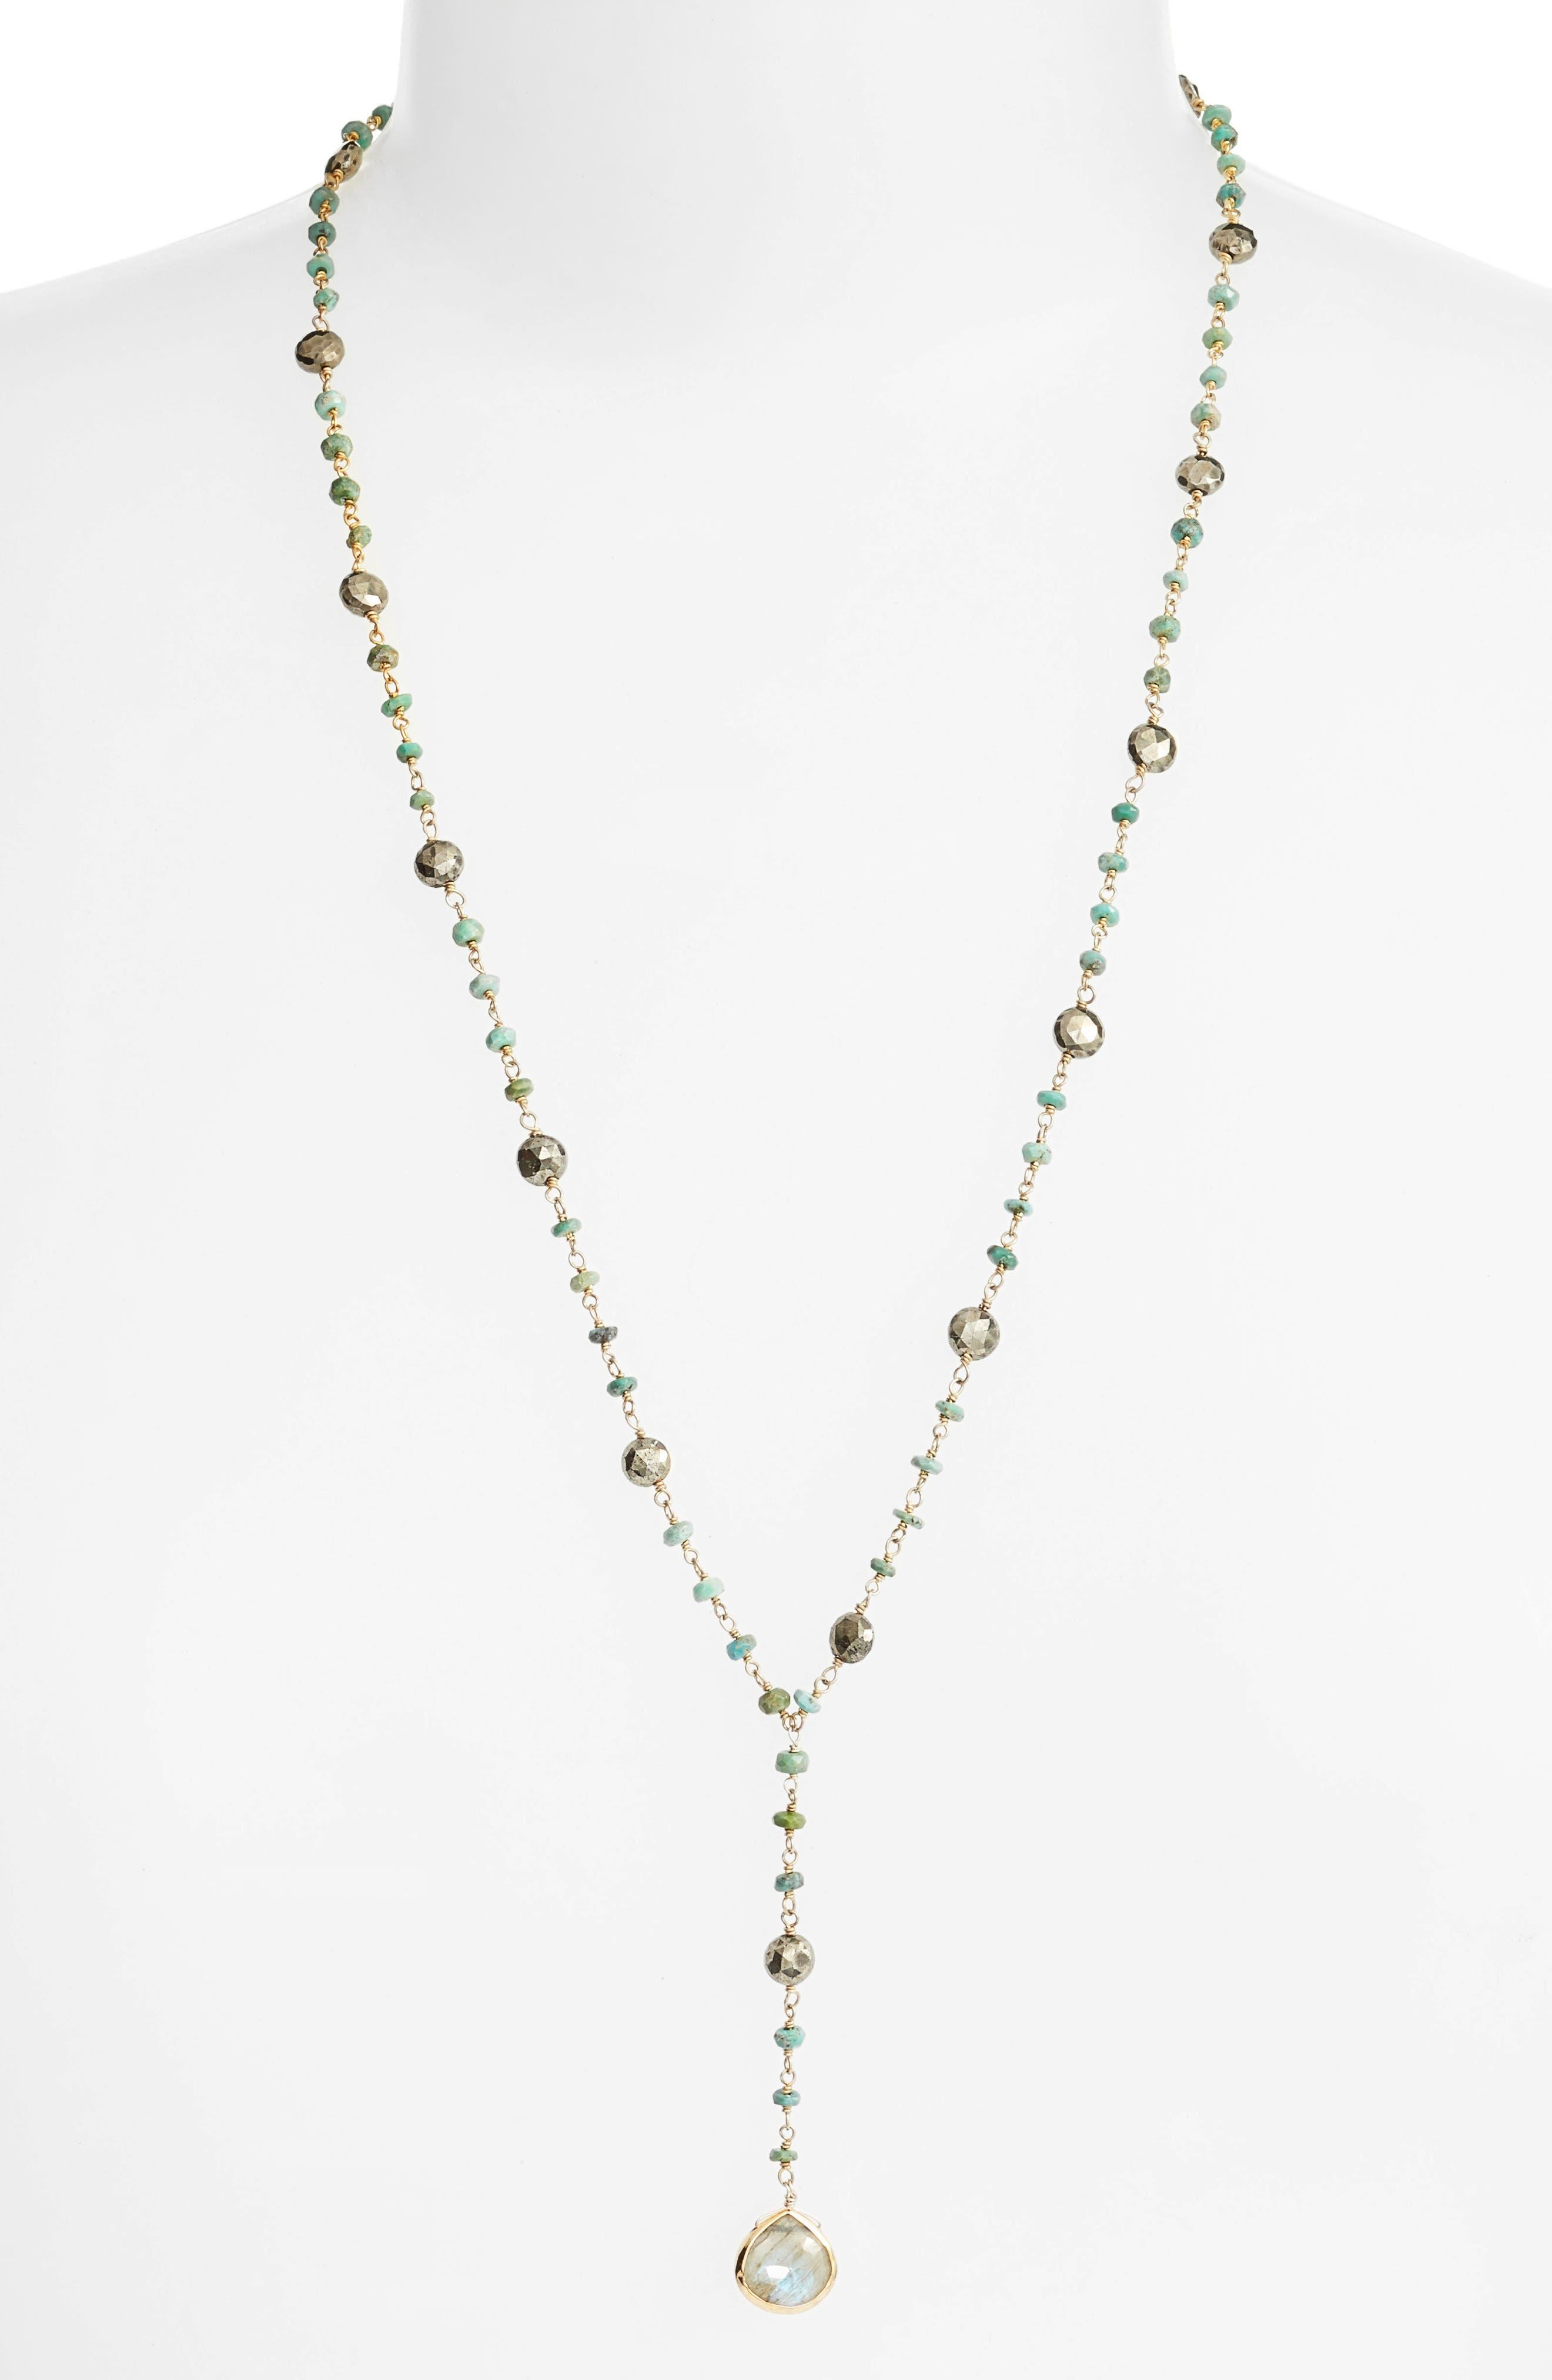 Yaeli Satellite 24 Semiprecious Stone Y-Necklace,                         Main,                         color, Turquoise / Labradorite